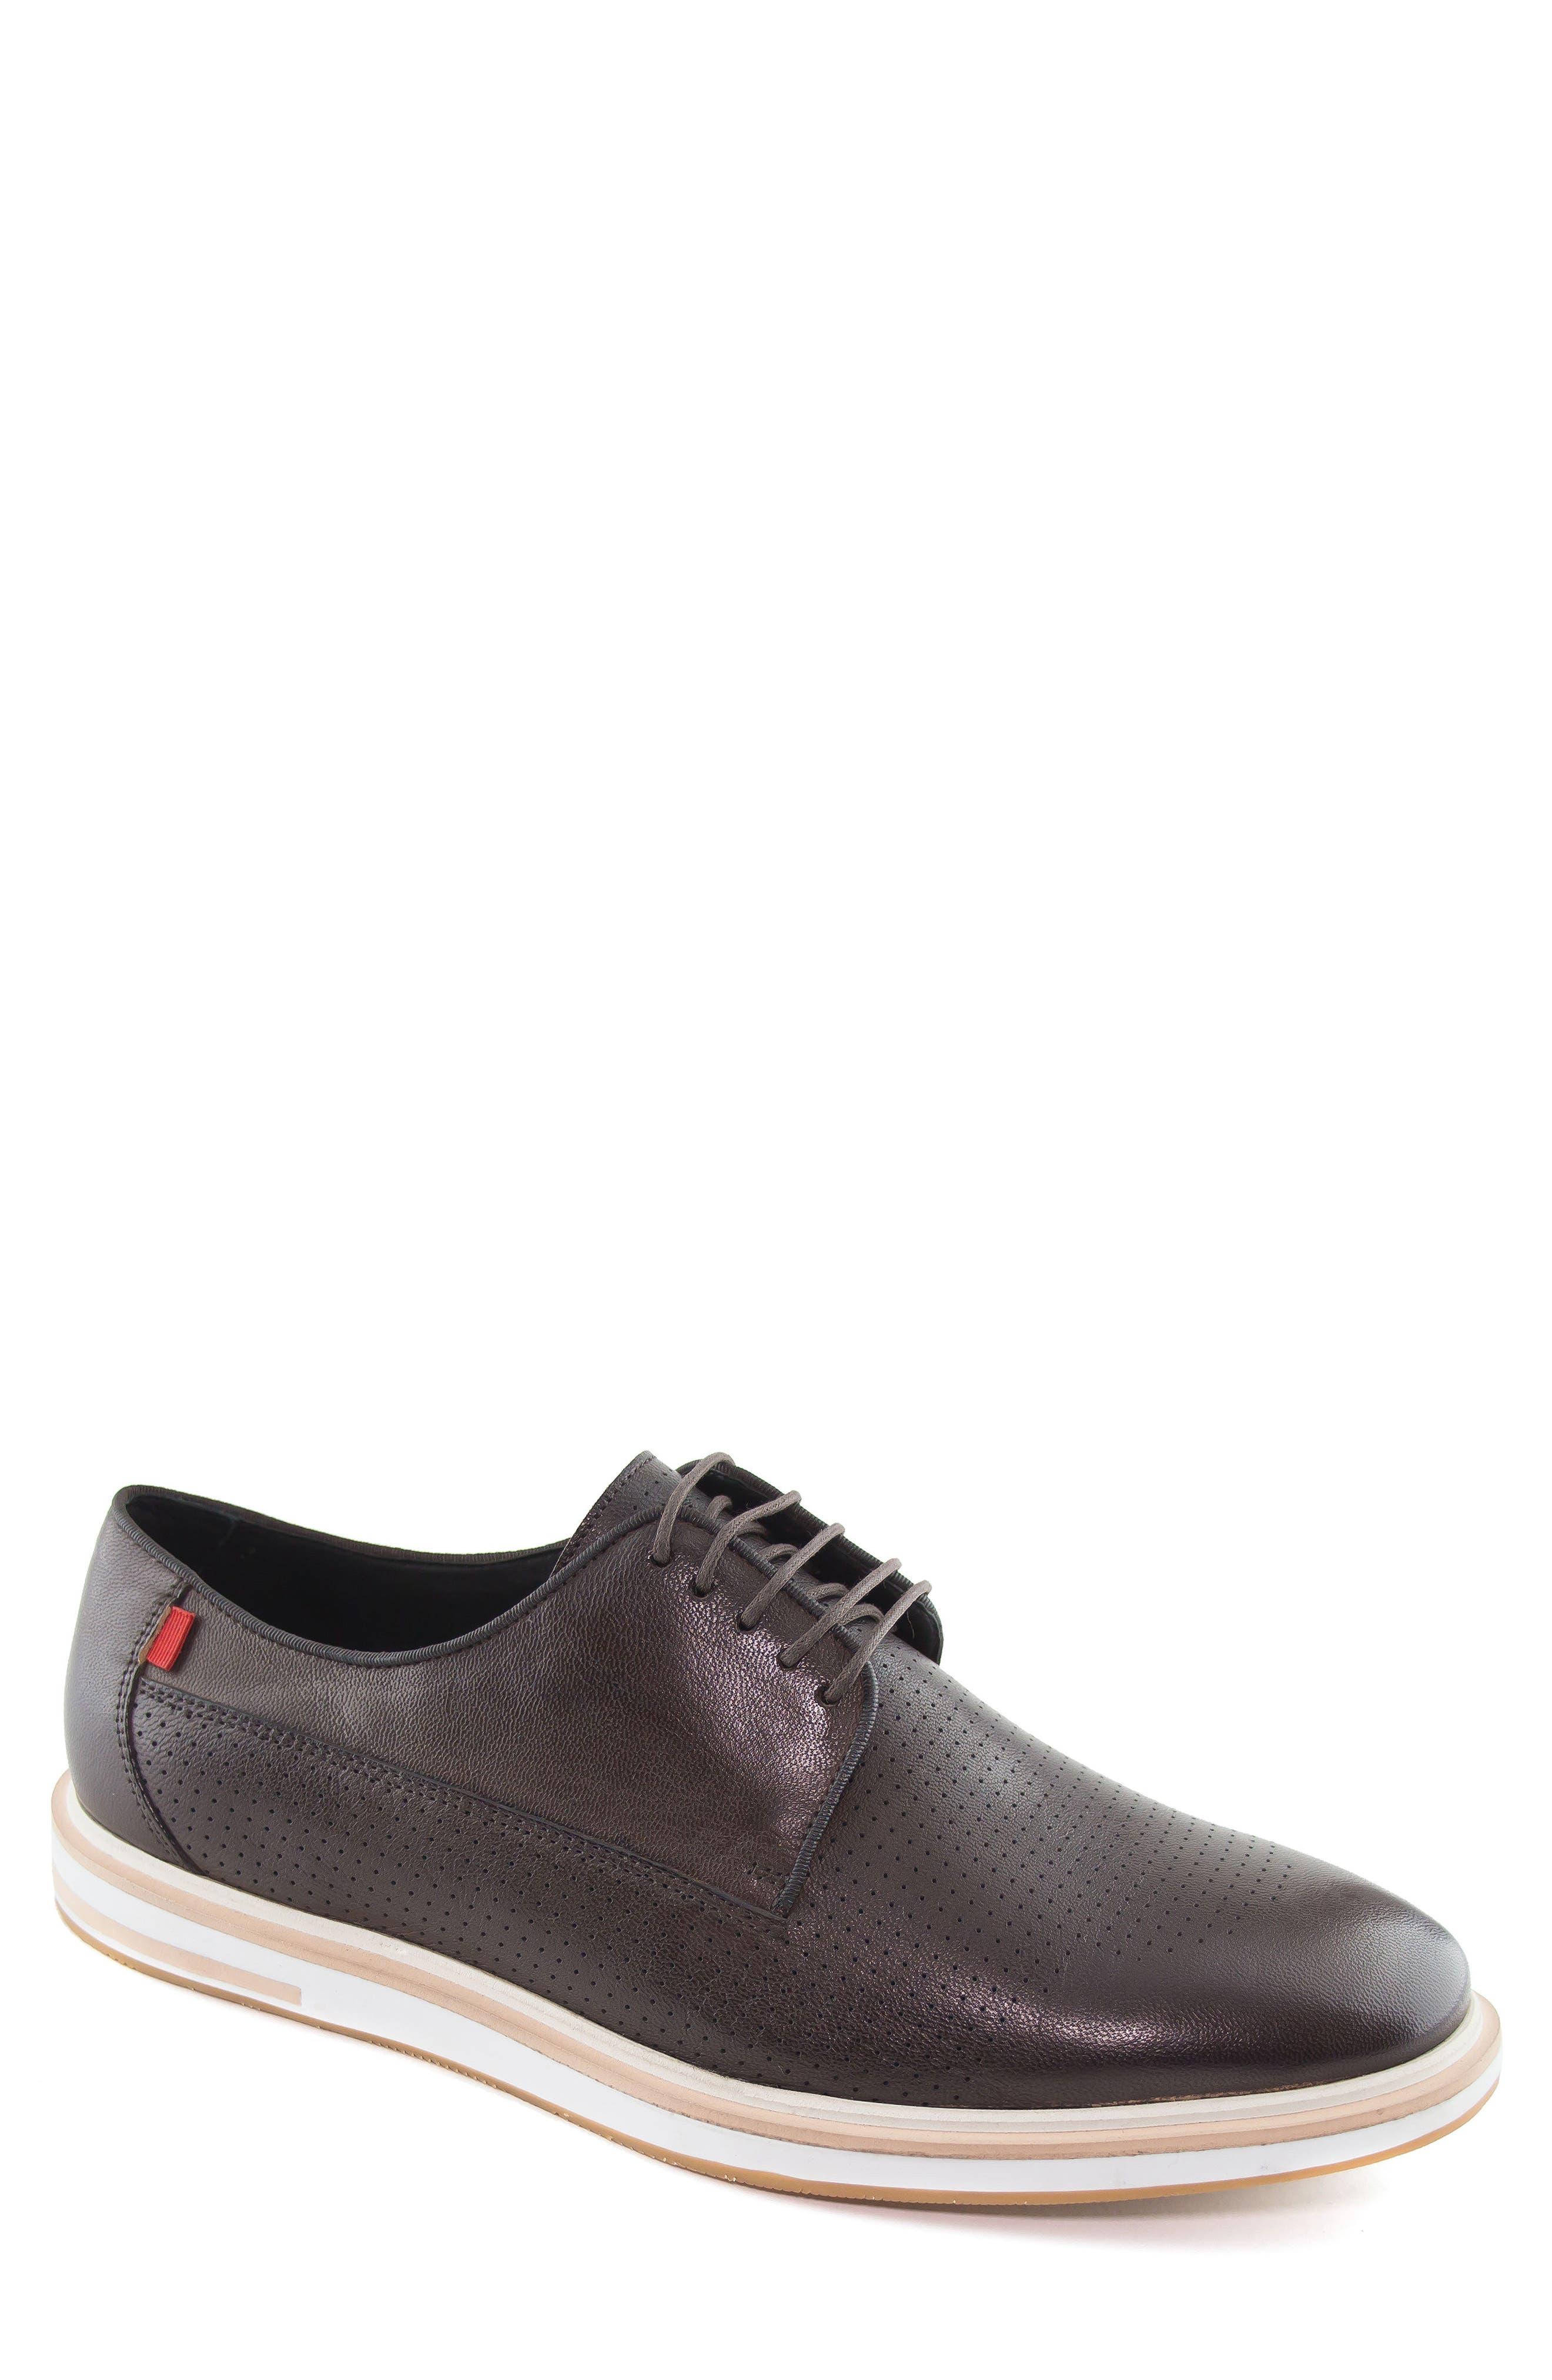 MARC JOSEPH NEW YORK, Manhattan Sneaker, Main thumbnail 1, color, 205